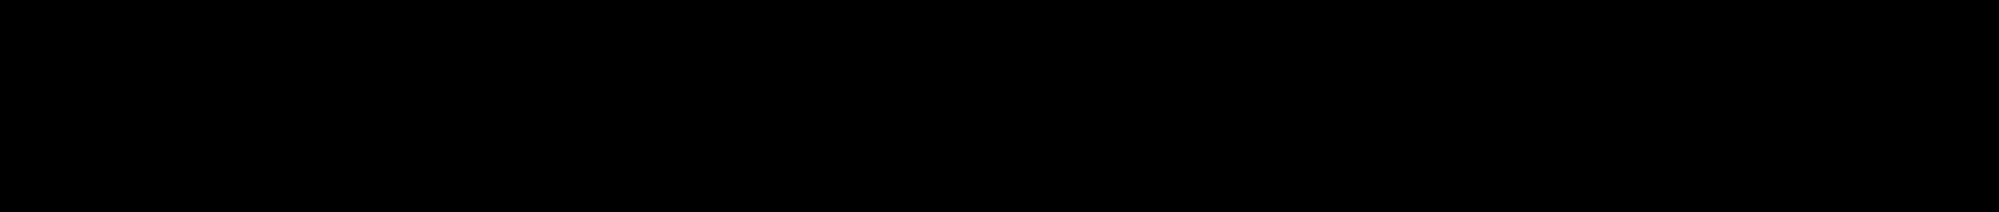 image79.png